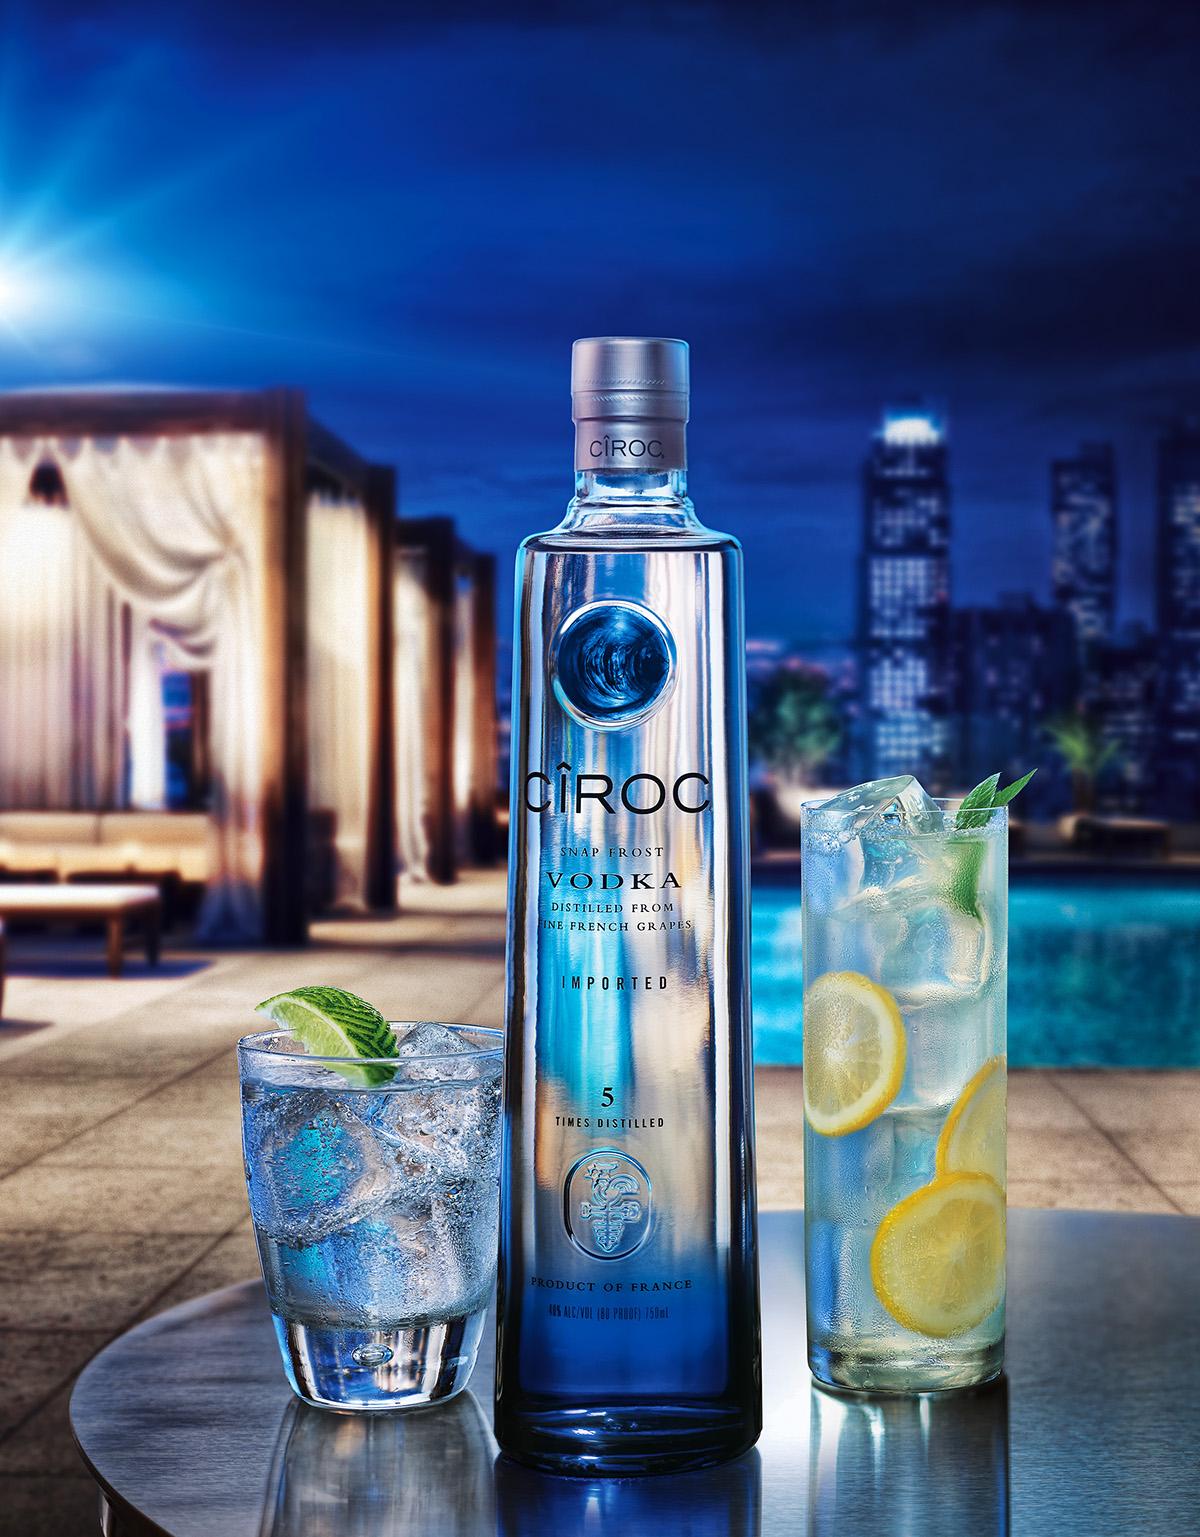 Ciroc Vodka on Behance - 555.9KB